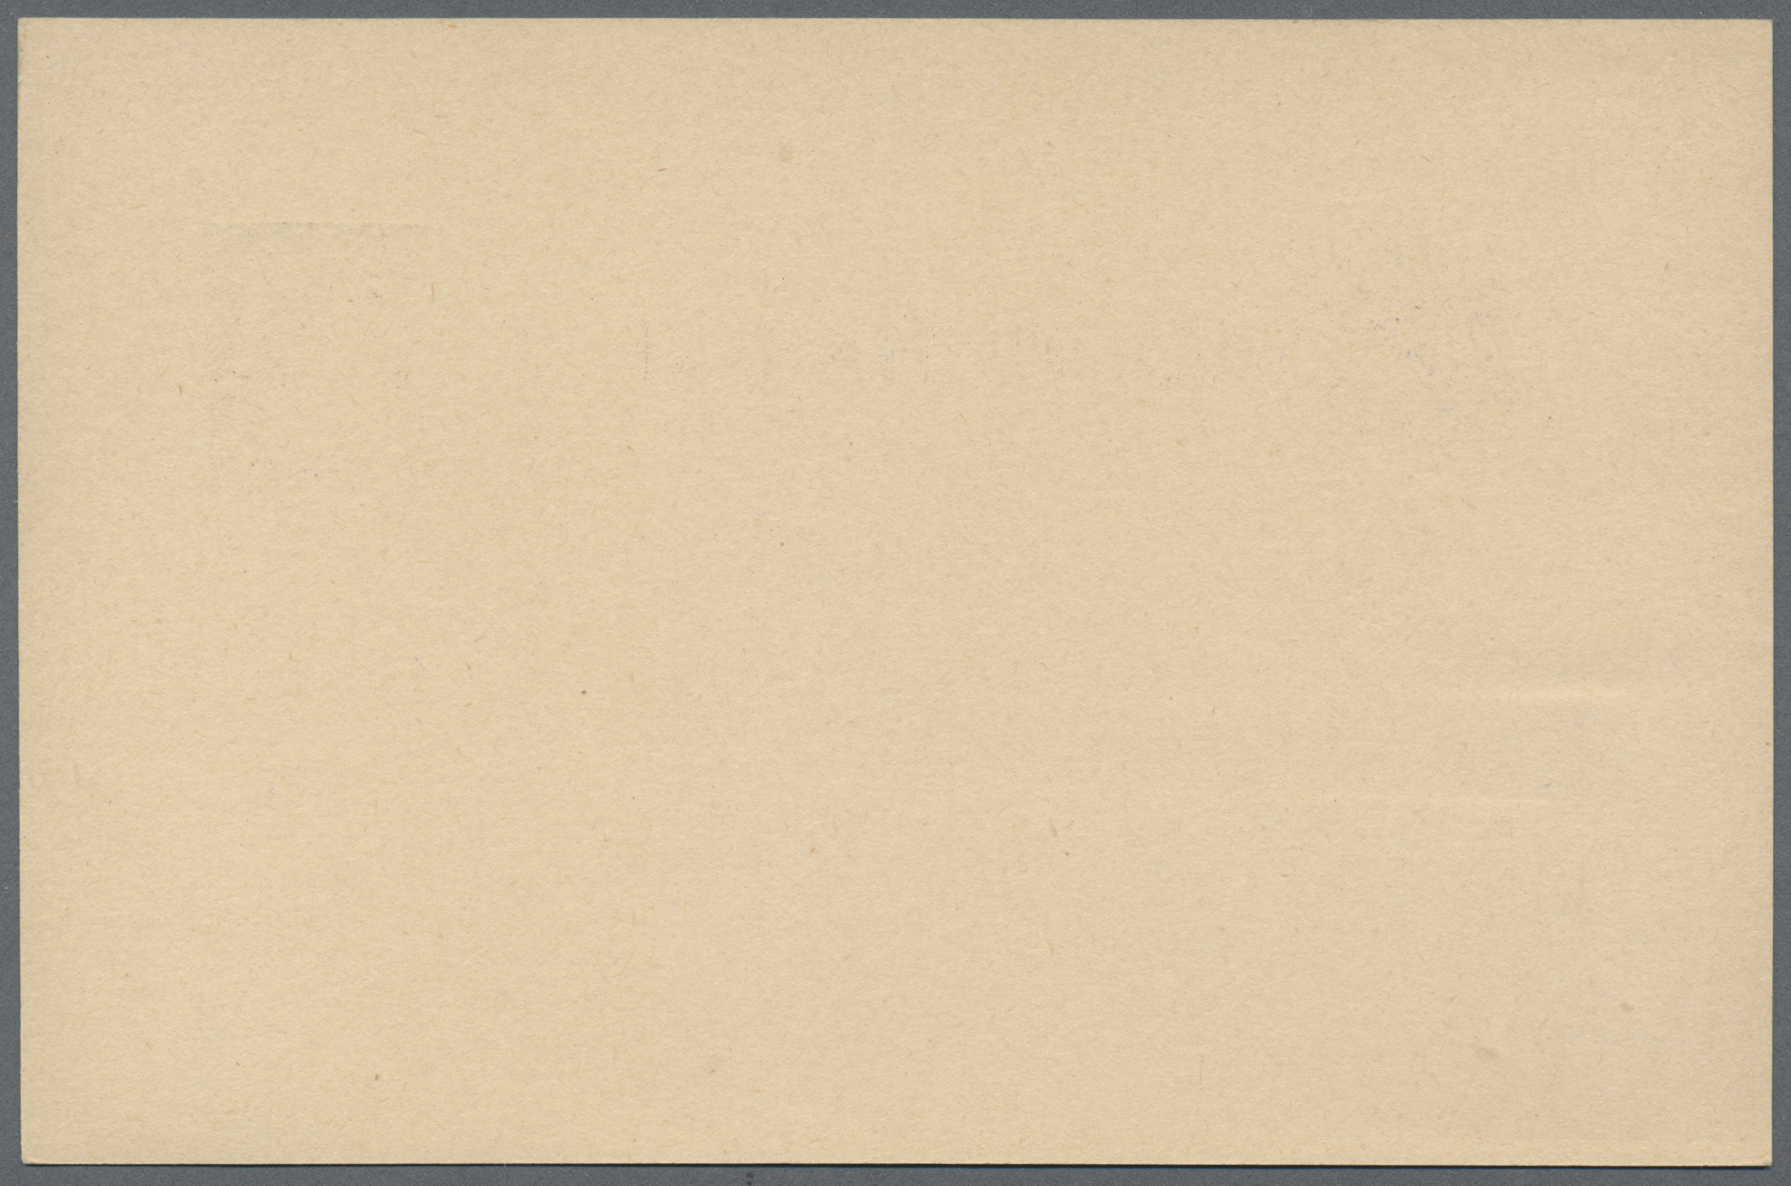 Lot 01759 - Serbien - Ganzsachen  -  Auktionshaus Christoph Gärtner GmbH & Co. KG Special auction